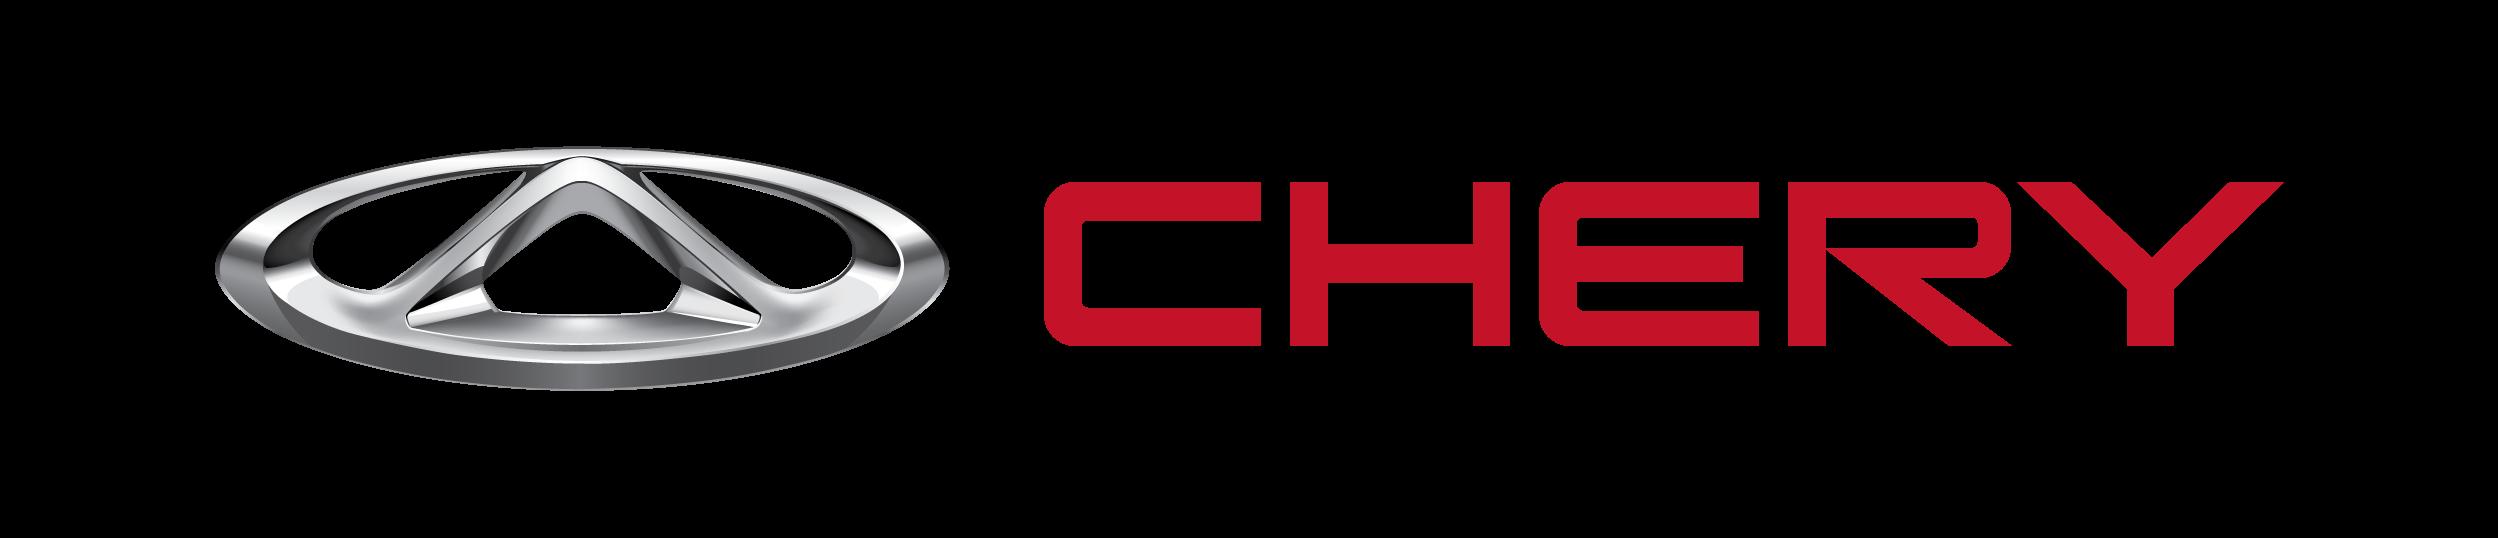 chery-logo-02